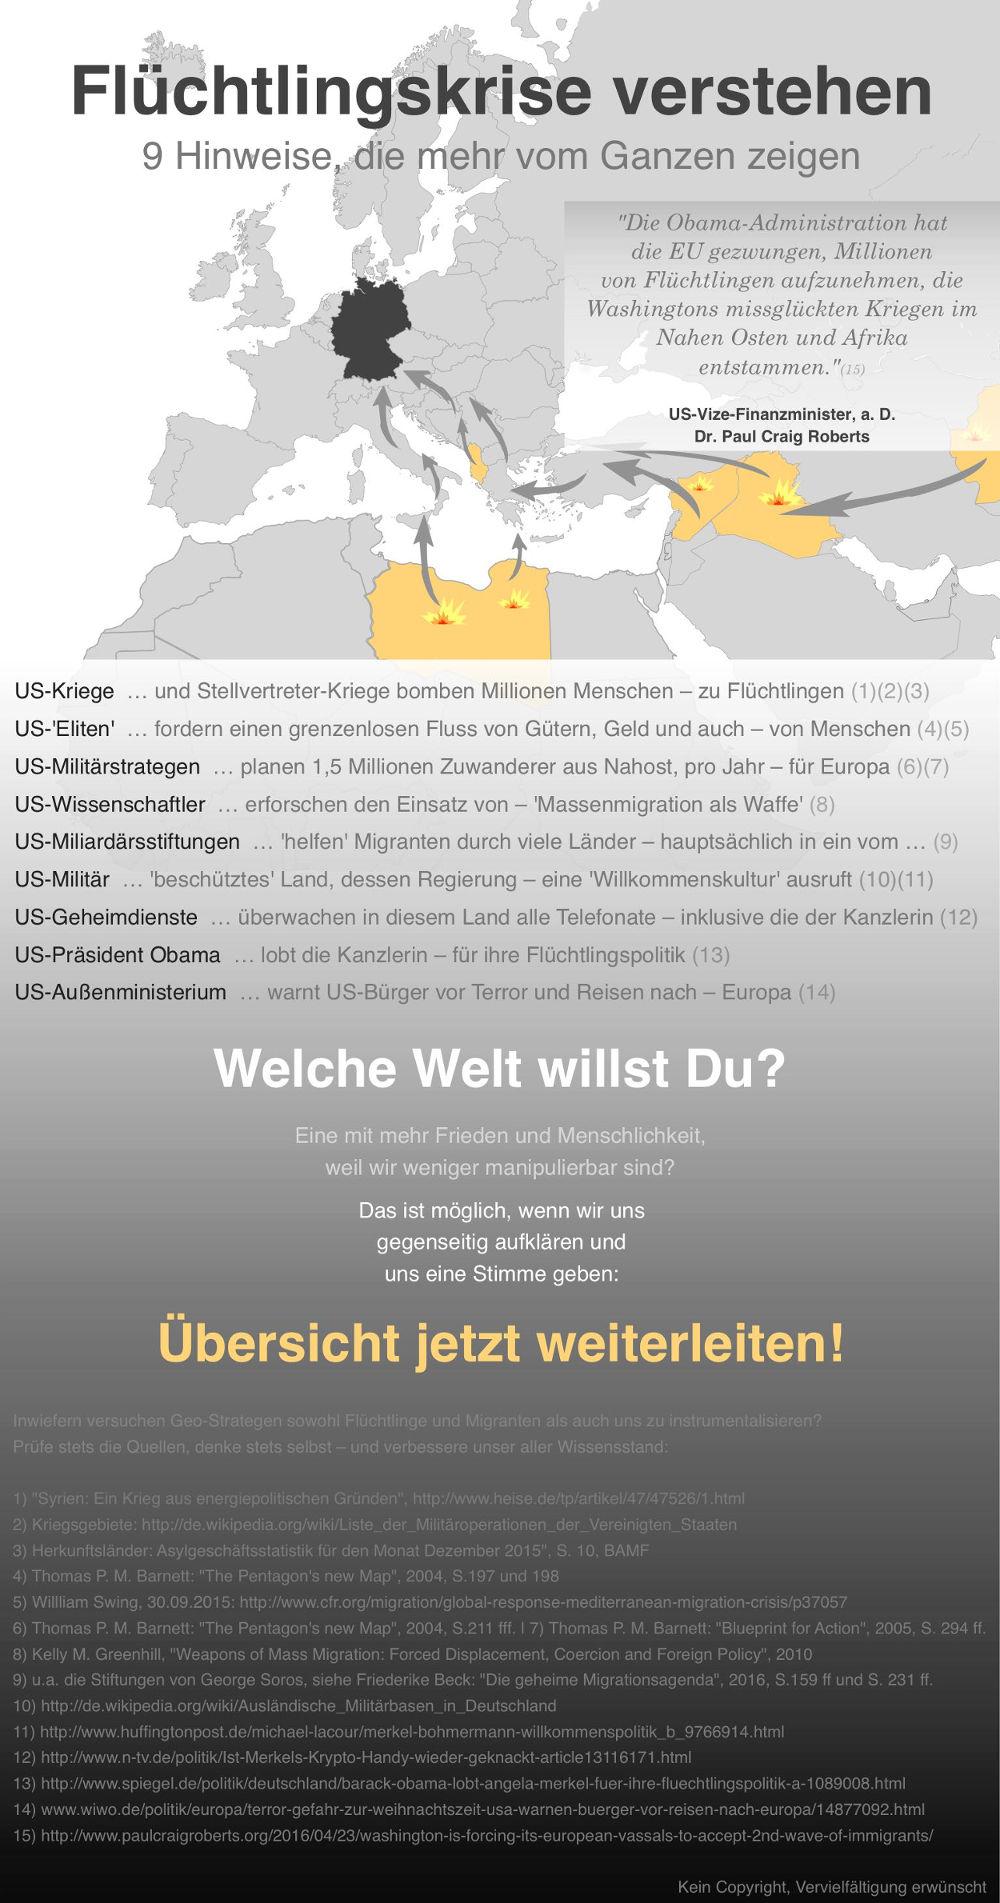 Infografik - Flüchtlingskrise verstehen - Bildquelle: unbekannt, CC BY-NC-SA-Lizenz